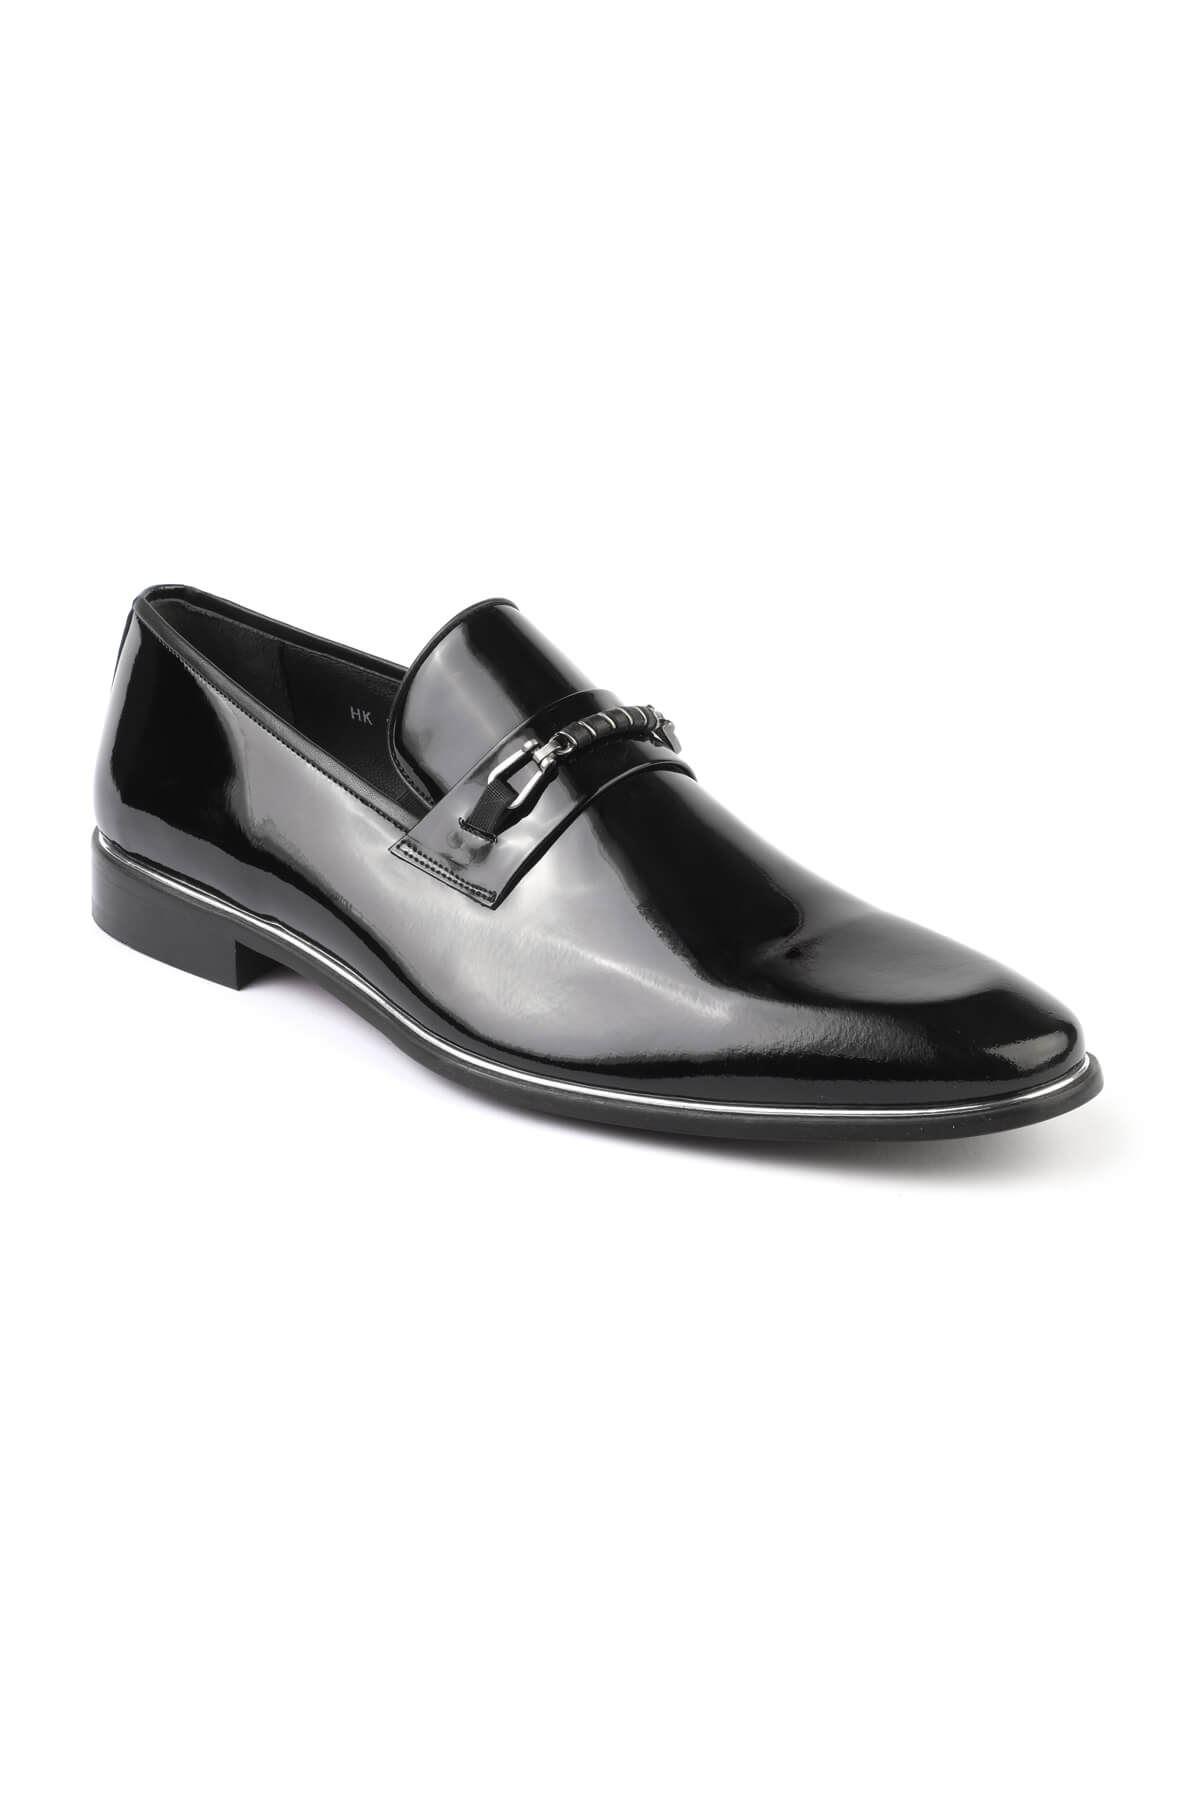 Libero T946 Black Classic Shoes